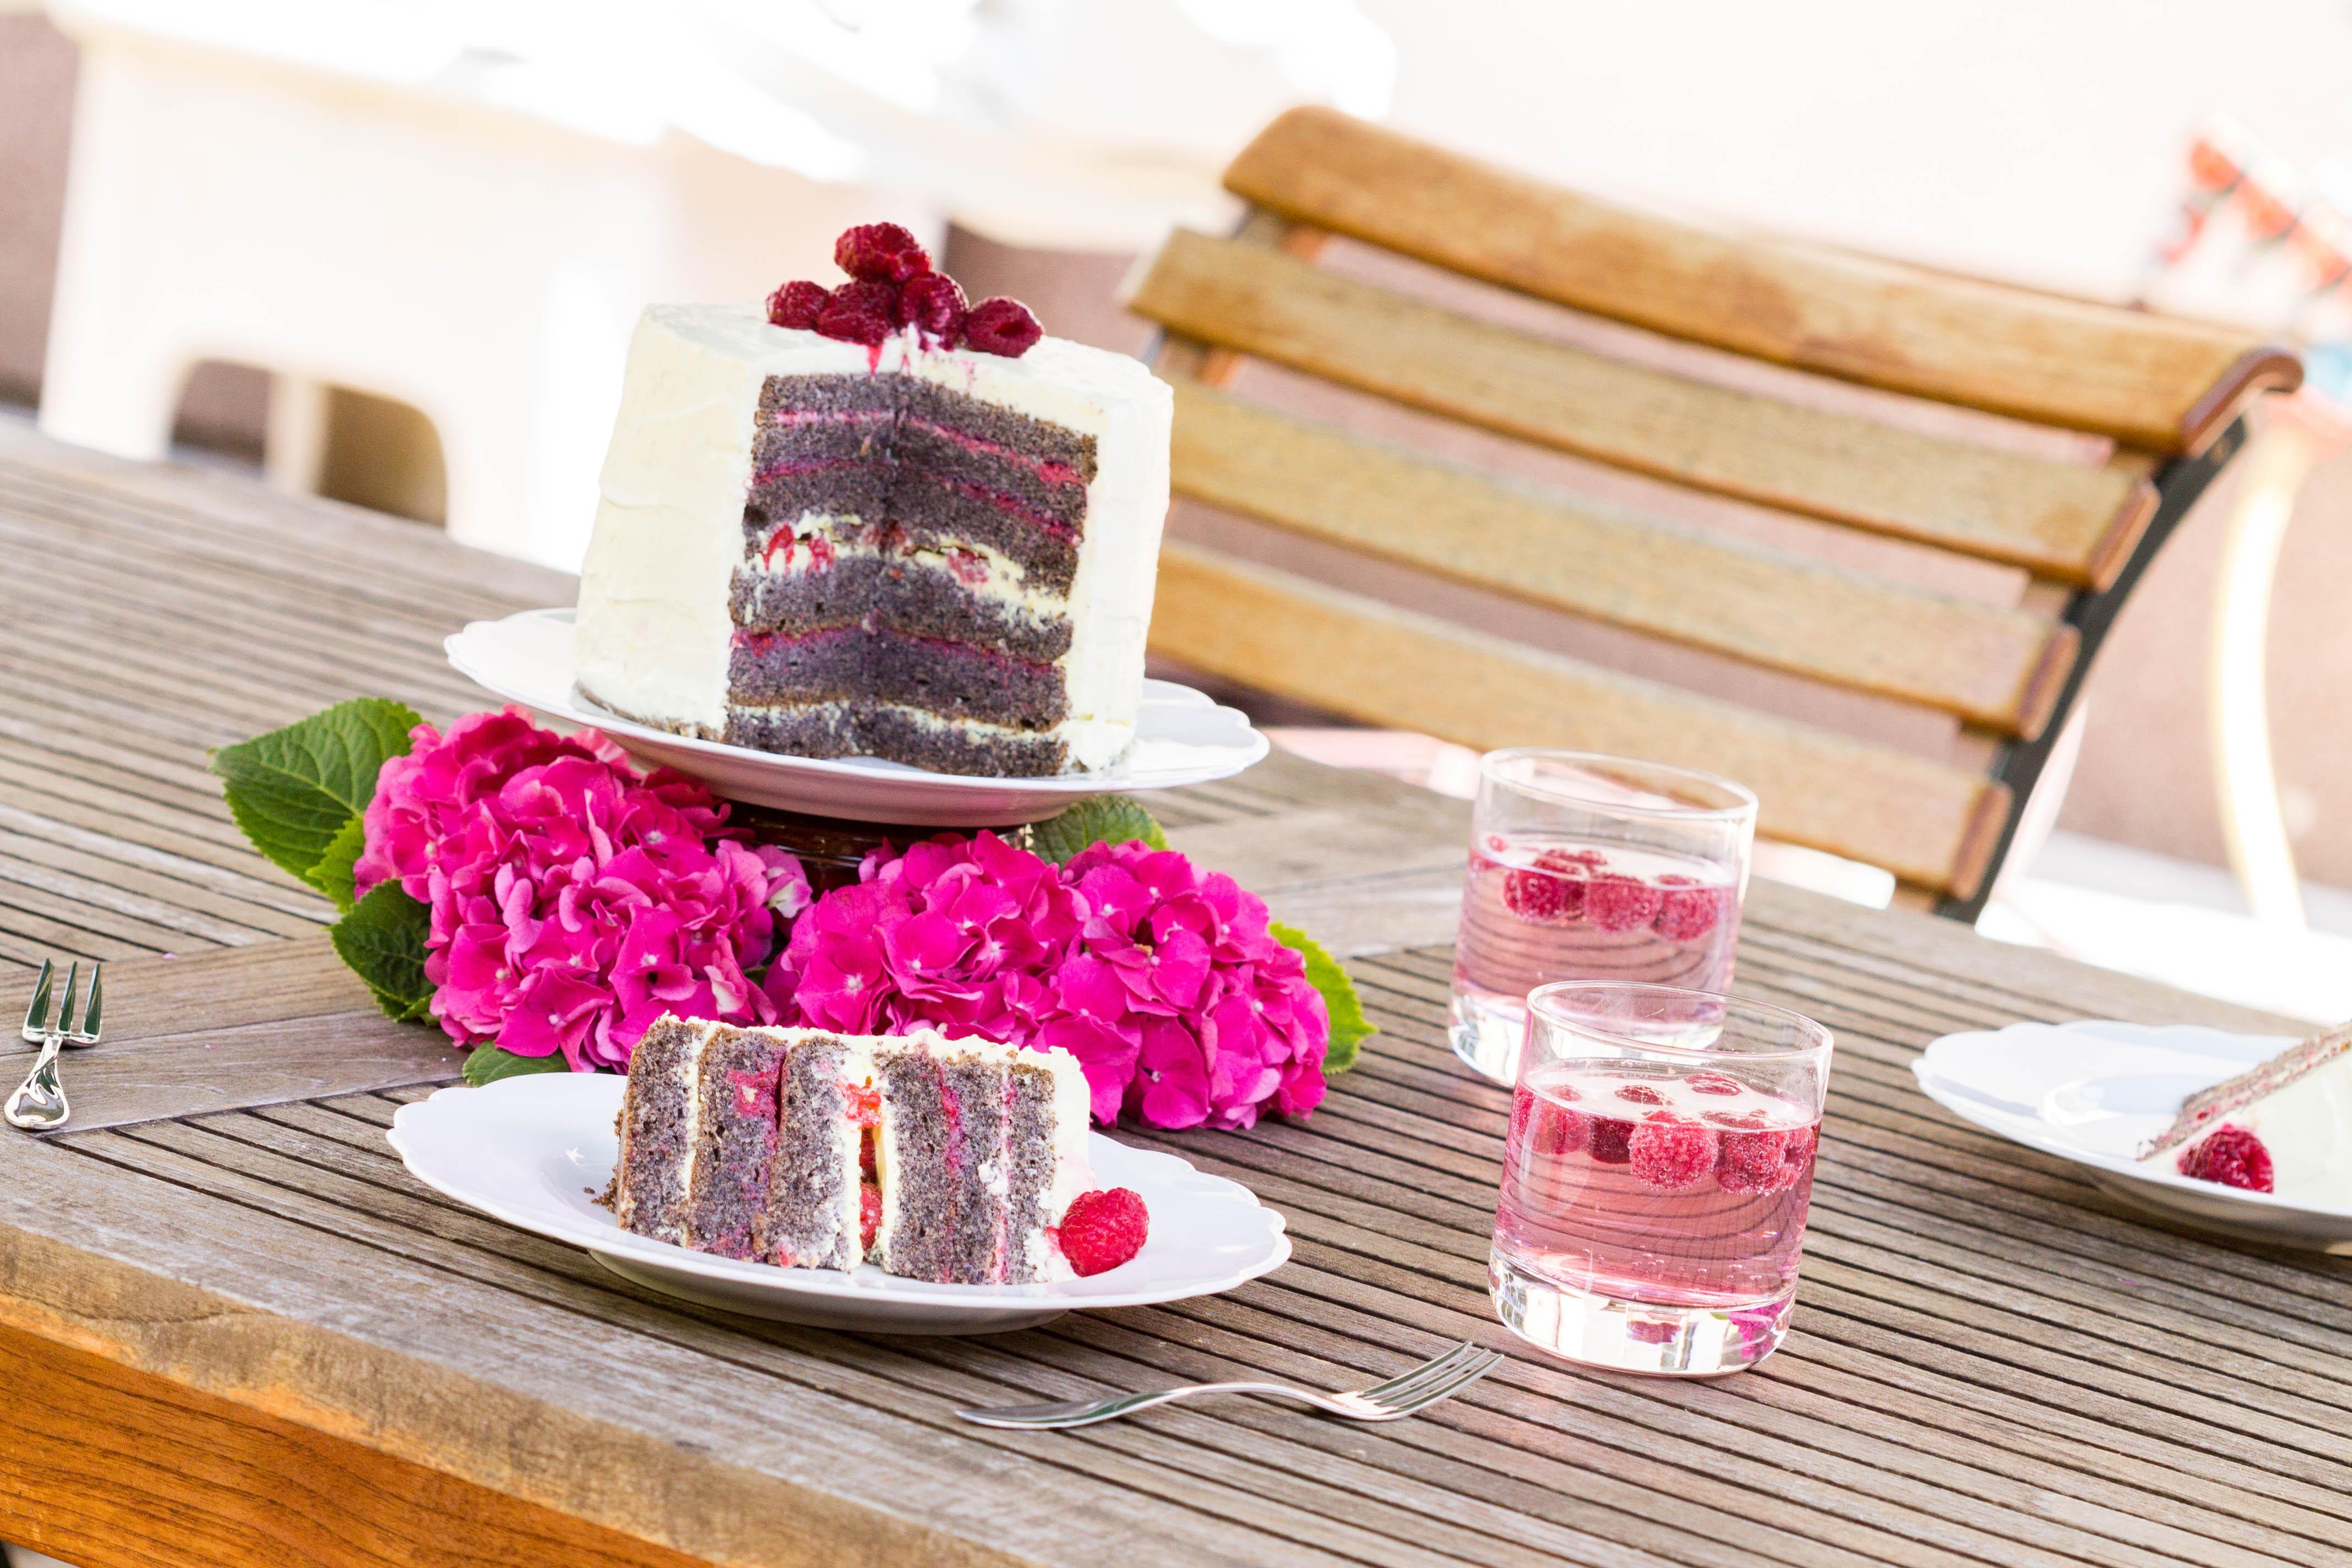 FAIBLE_Lemon-Poppyseed-Cake with Raspberries_lchf_8